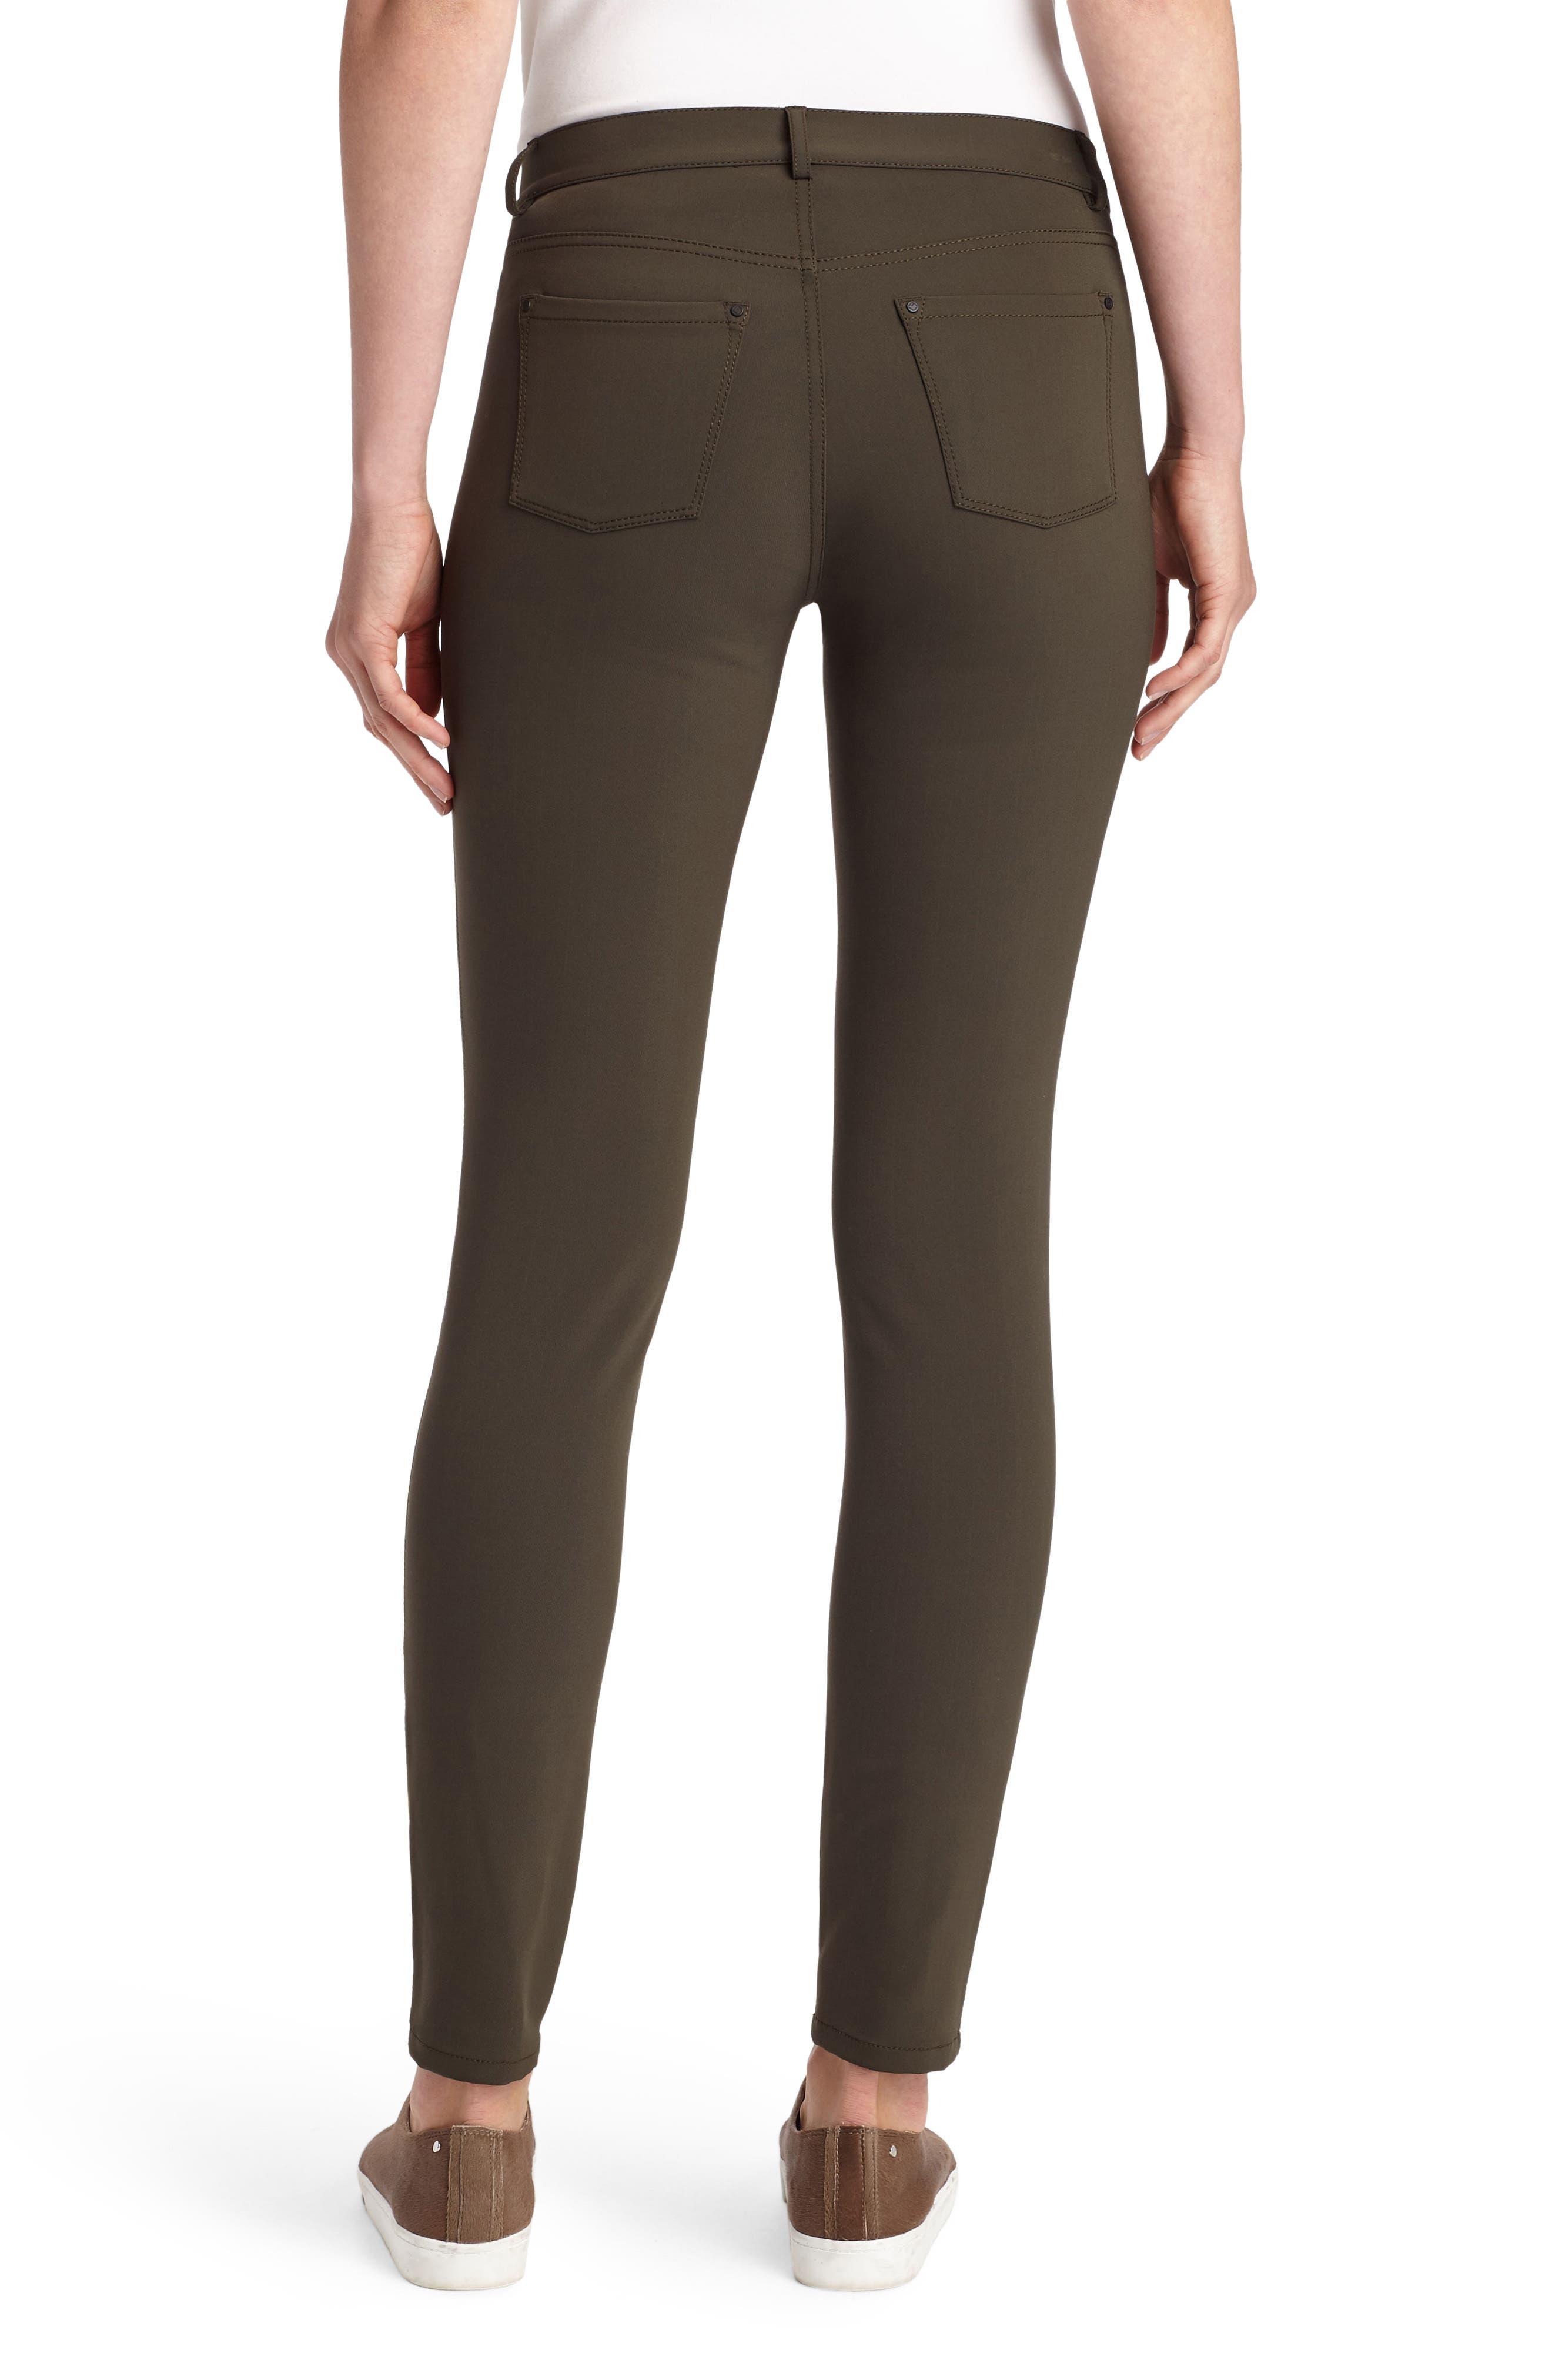 Alternate Image 2  - Lafayette 148 New York Mercer Acclaimed Stretch Skinny Pants